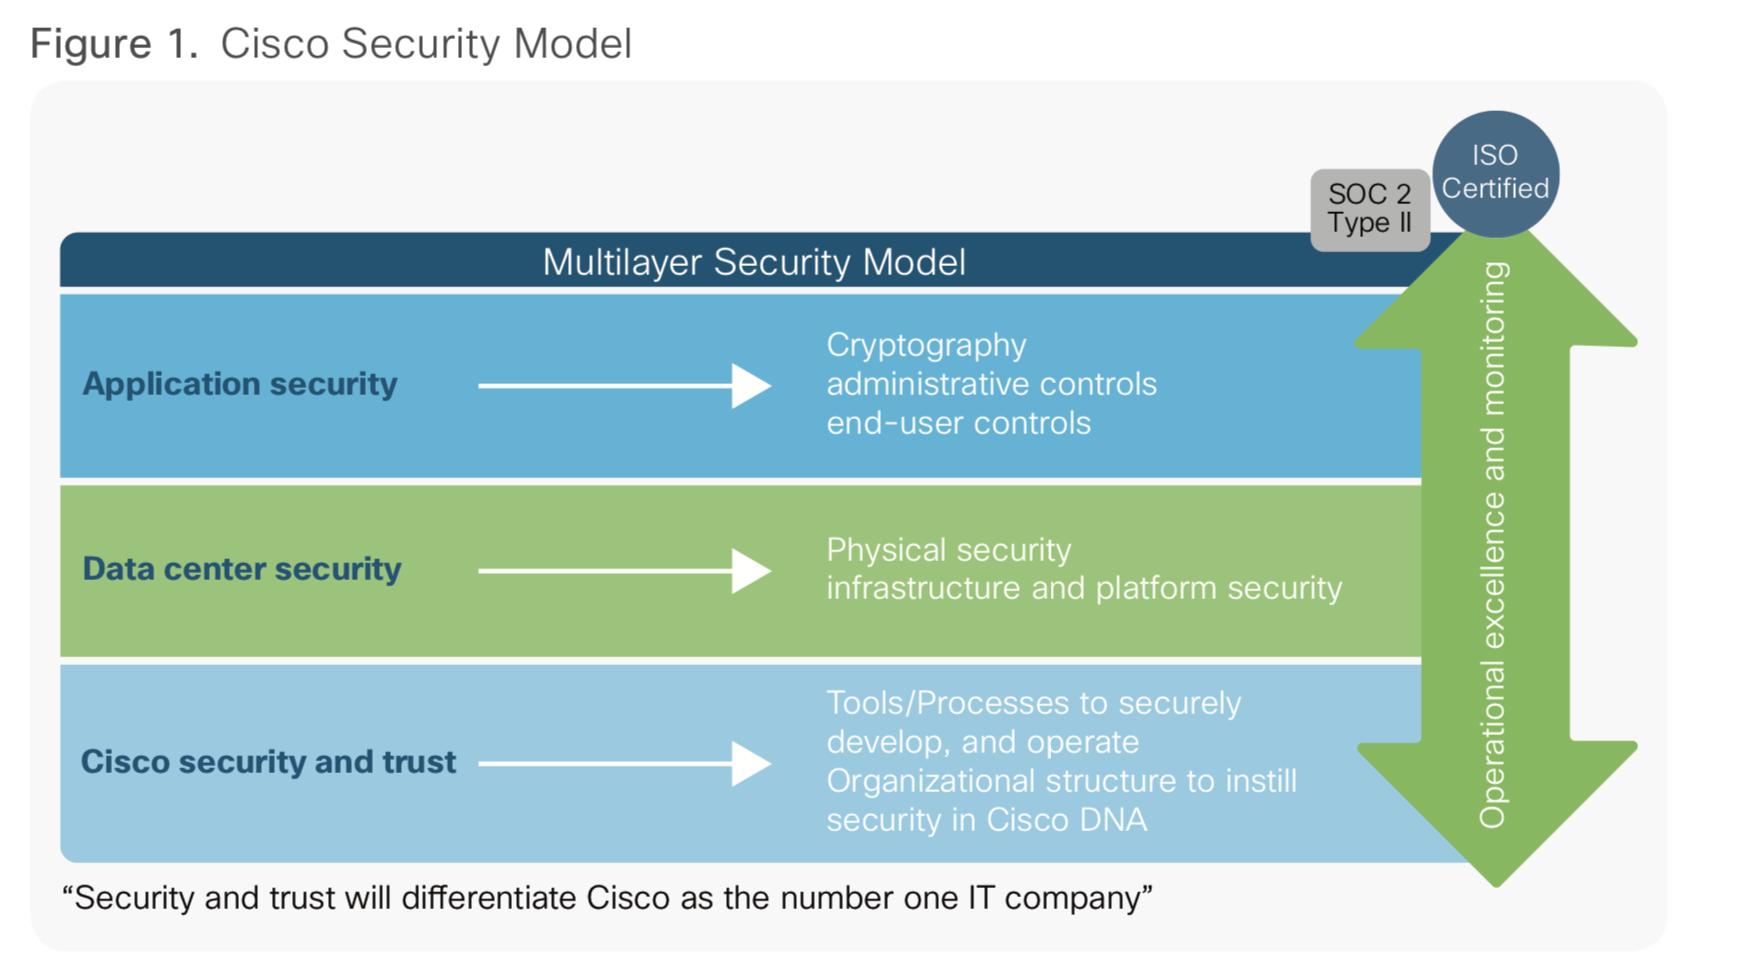 Cisco Security Model